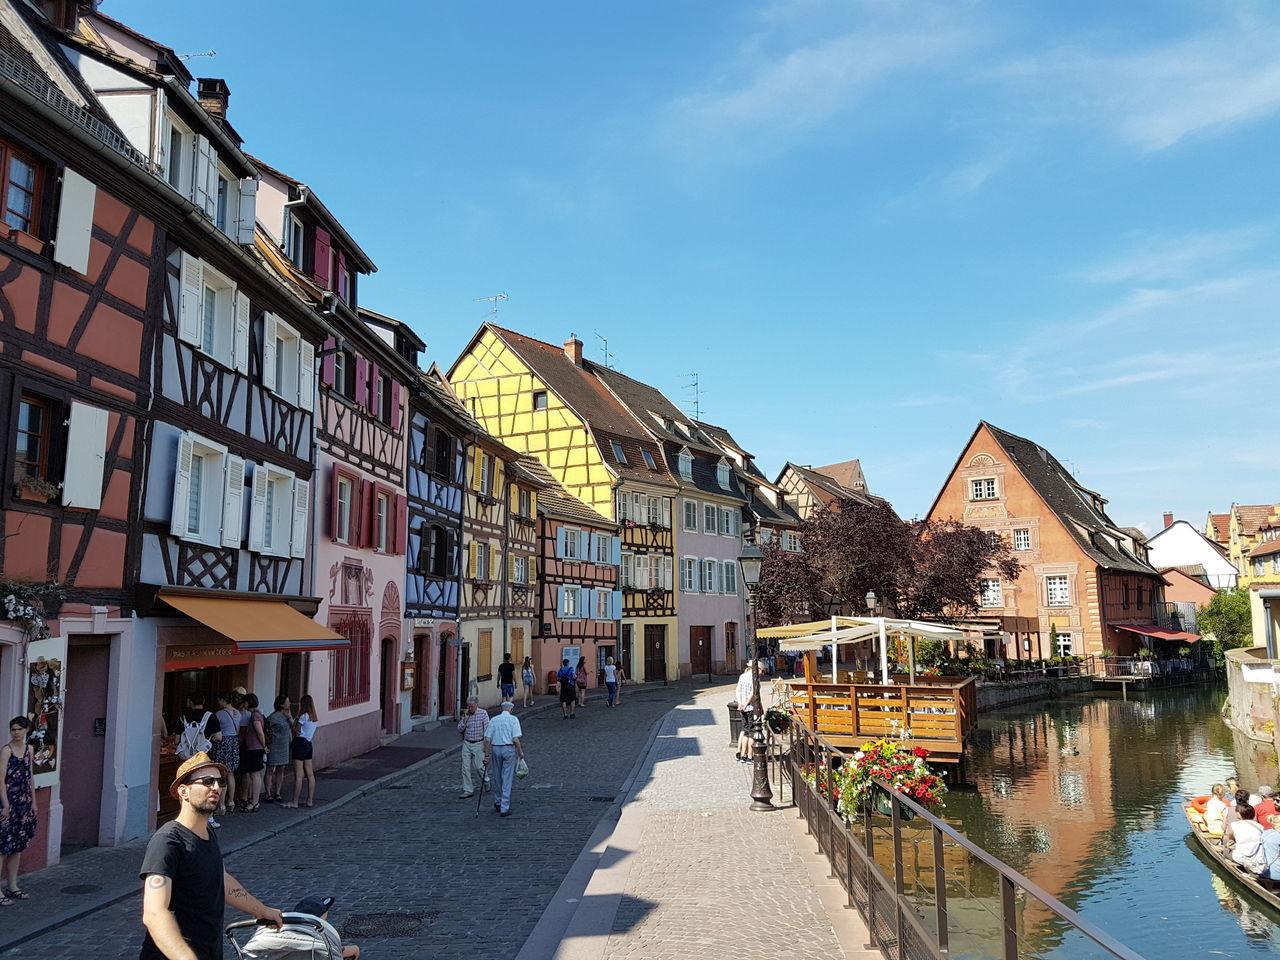 Colmar, Alsace, France Building Exterior Architecture Outdoors Sky Day Tourism Travel City Built Structure Tranquility Europe Travel Destinations France Alsace